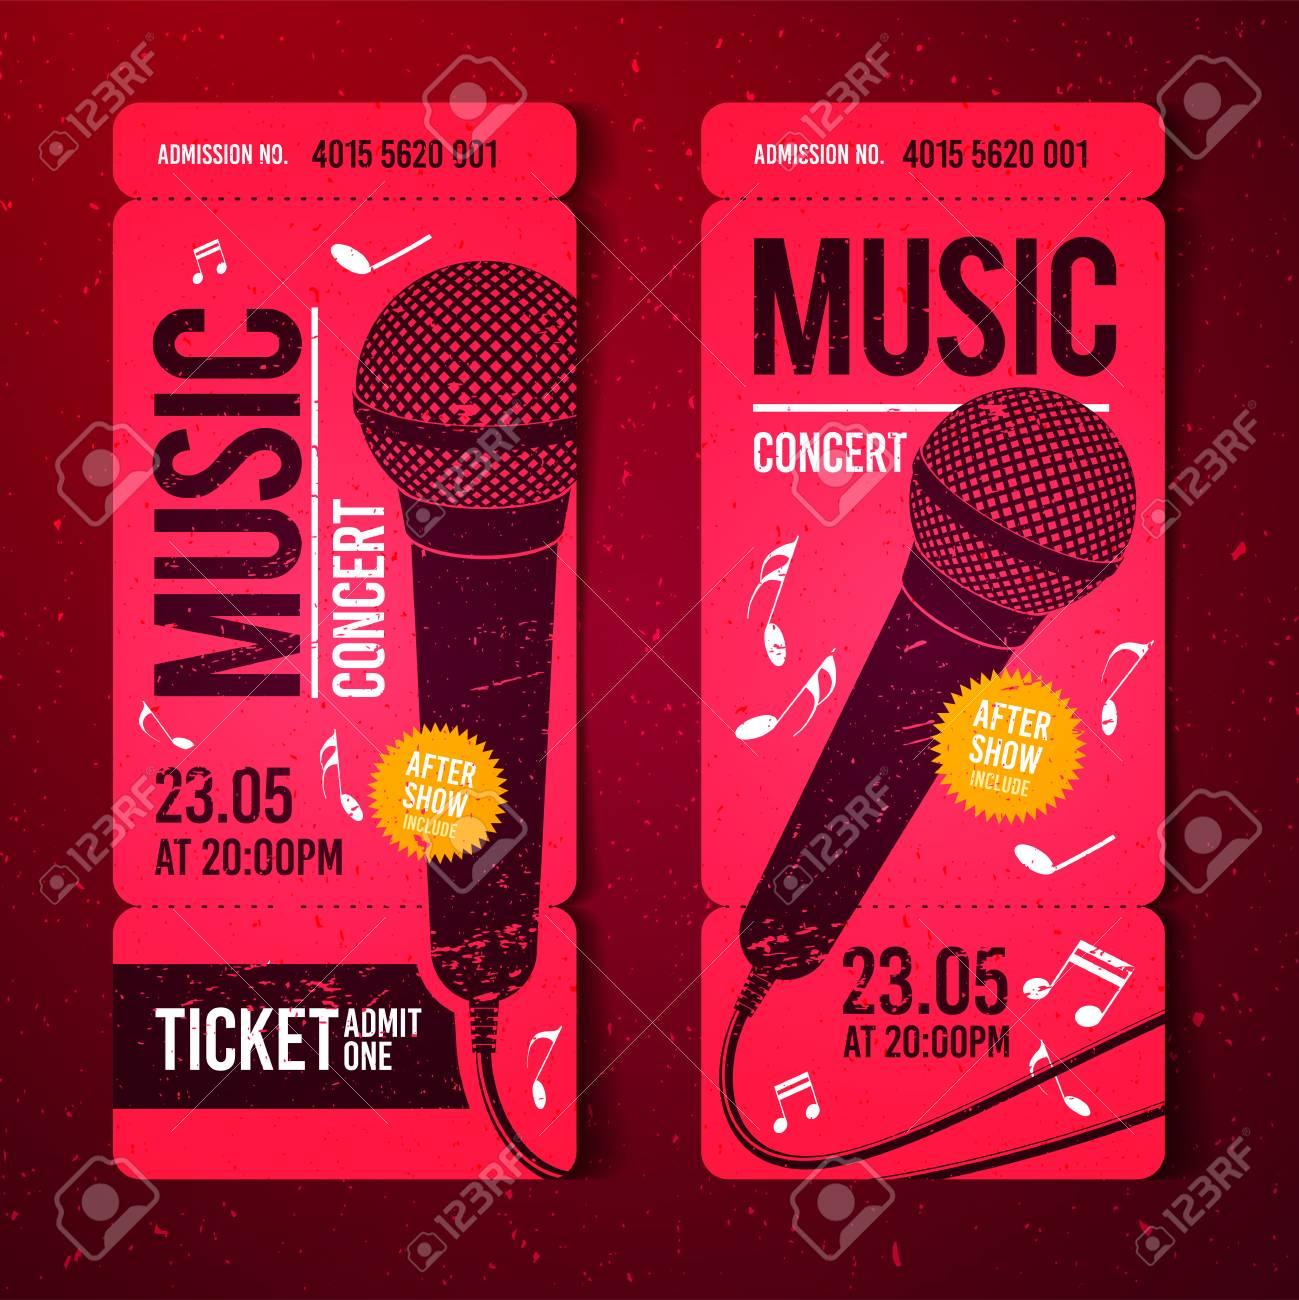 vector illustration red music concert ticket design template